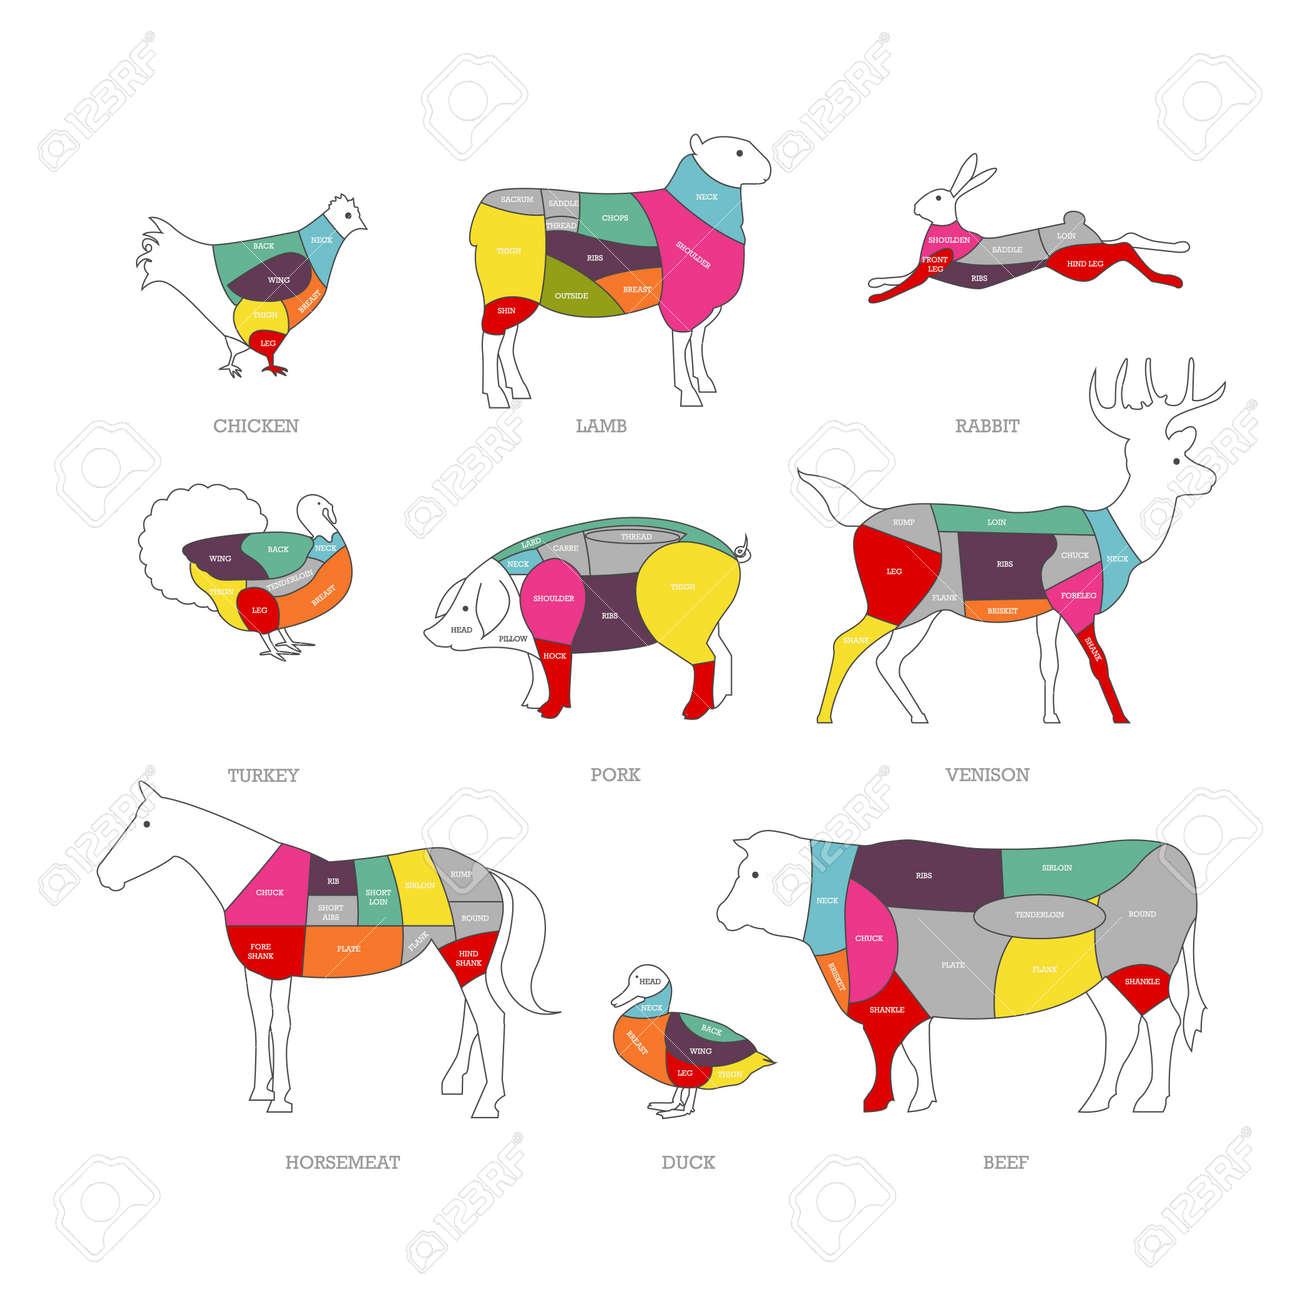 Butcher Shop Concept Vector Illustration Meat Cuts Animal Parts Diagram Of Pork Beef